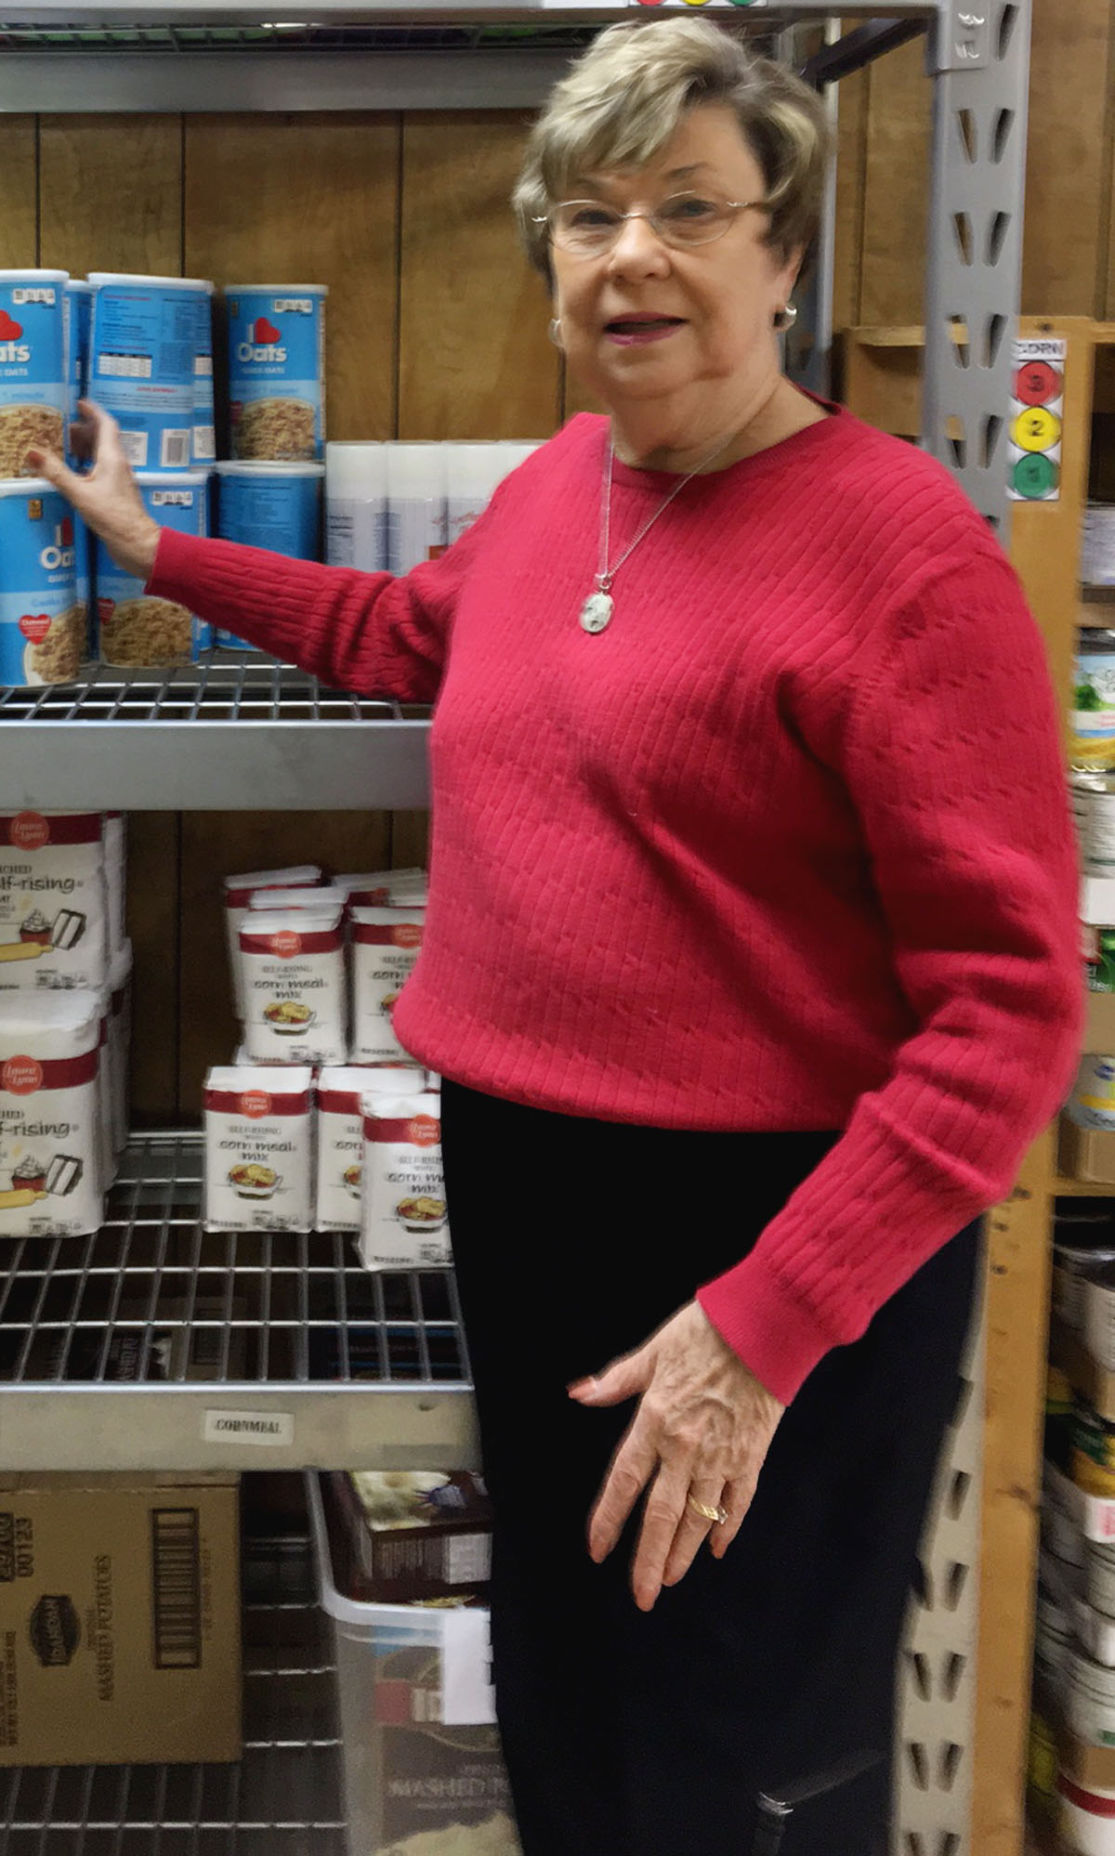 GFWC plans community food drive